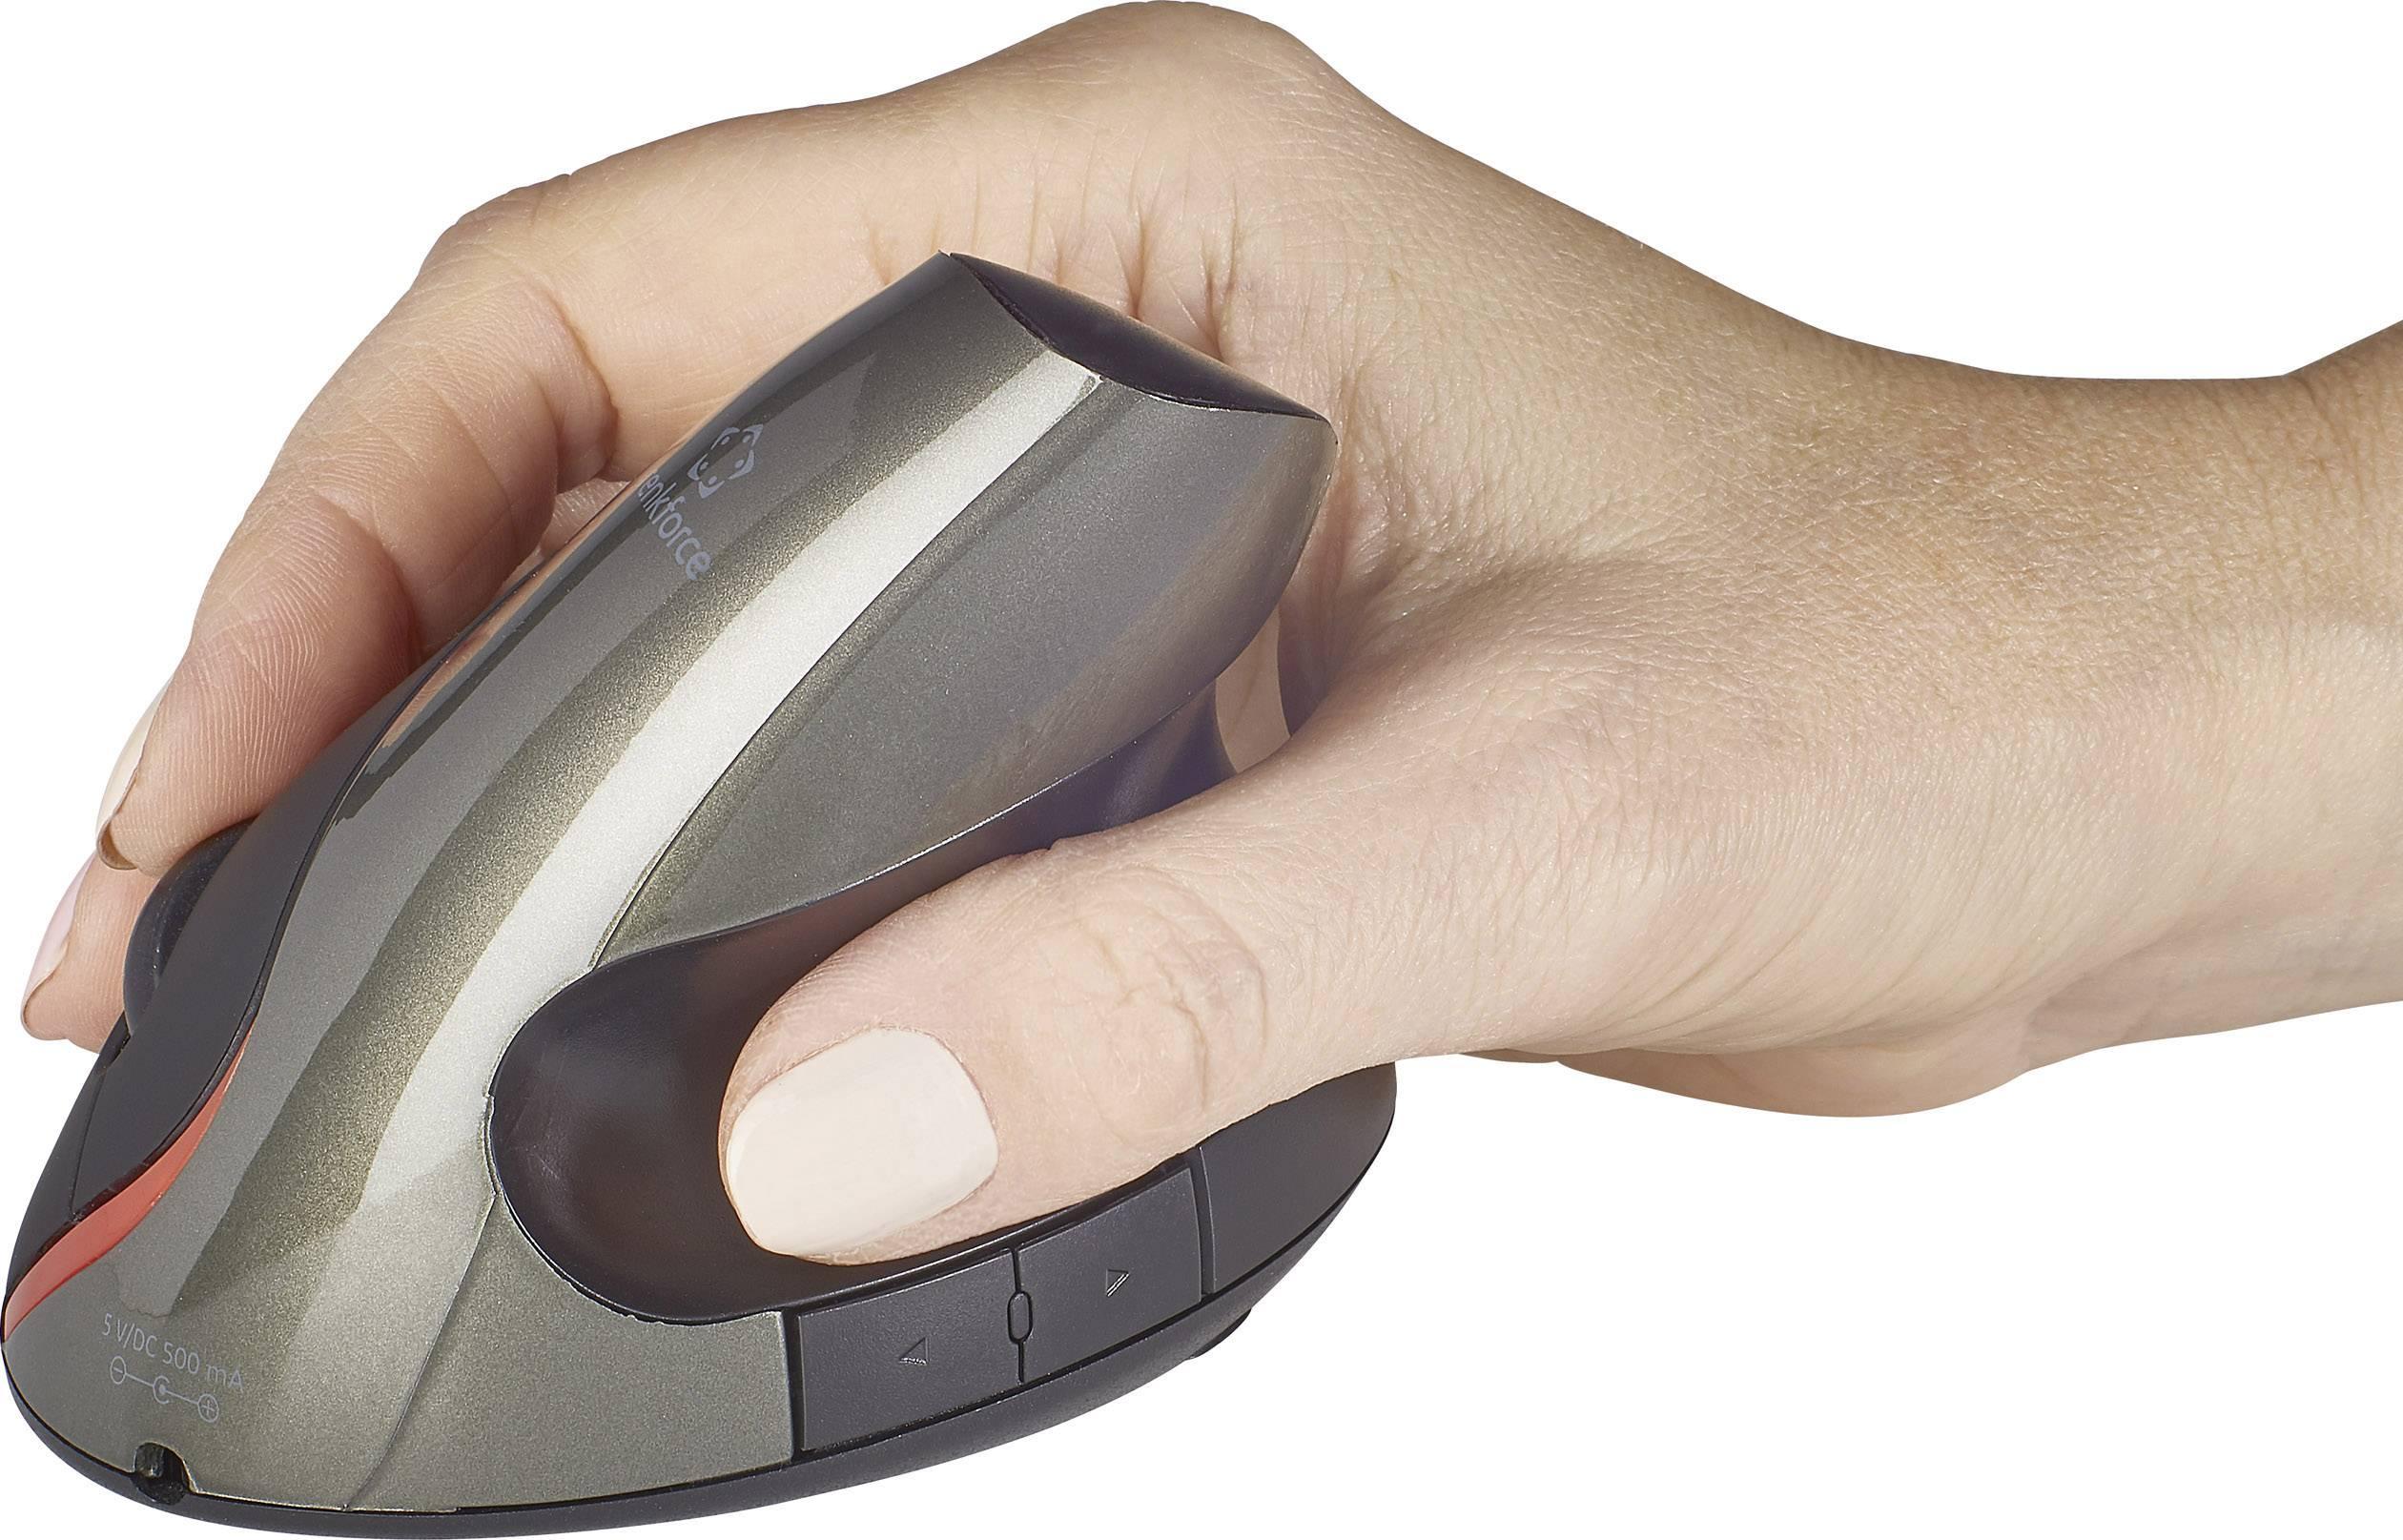 Optická bezdrôtová myš Renkforce RF-439 RF-4458408, ergonomická, čierna